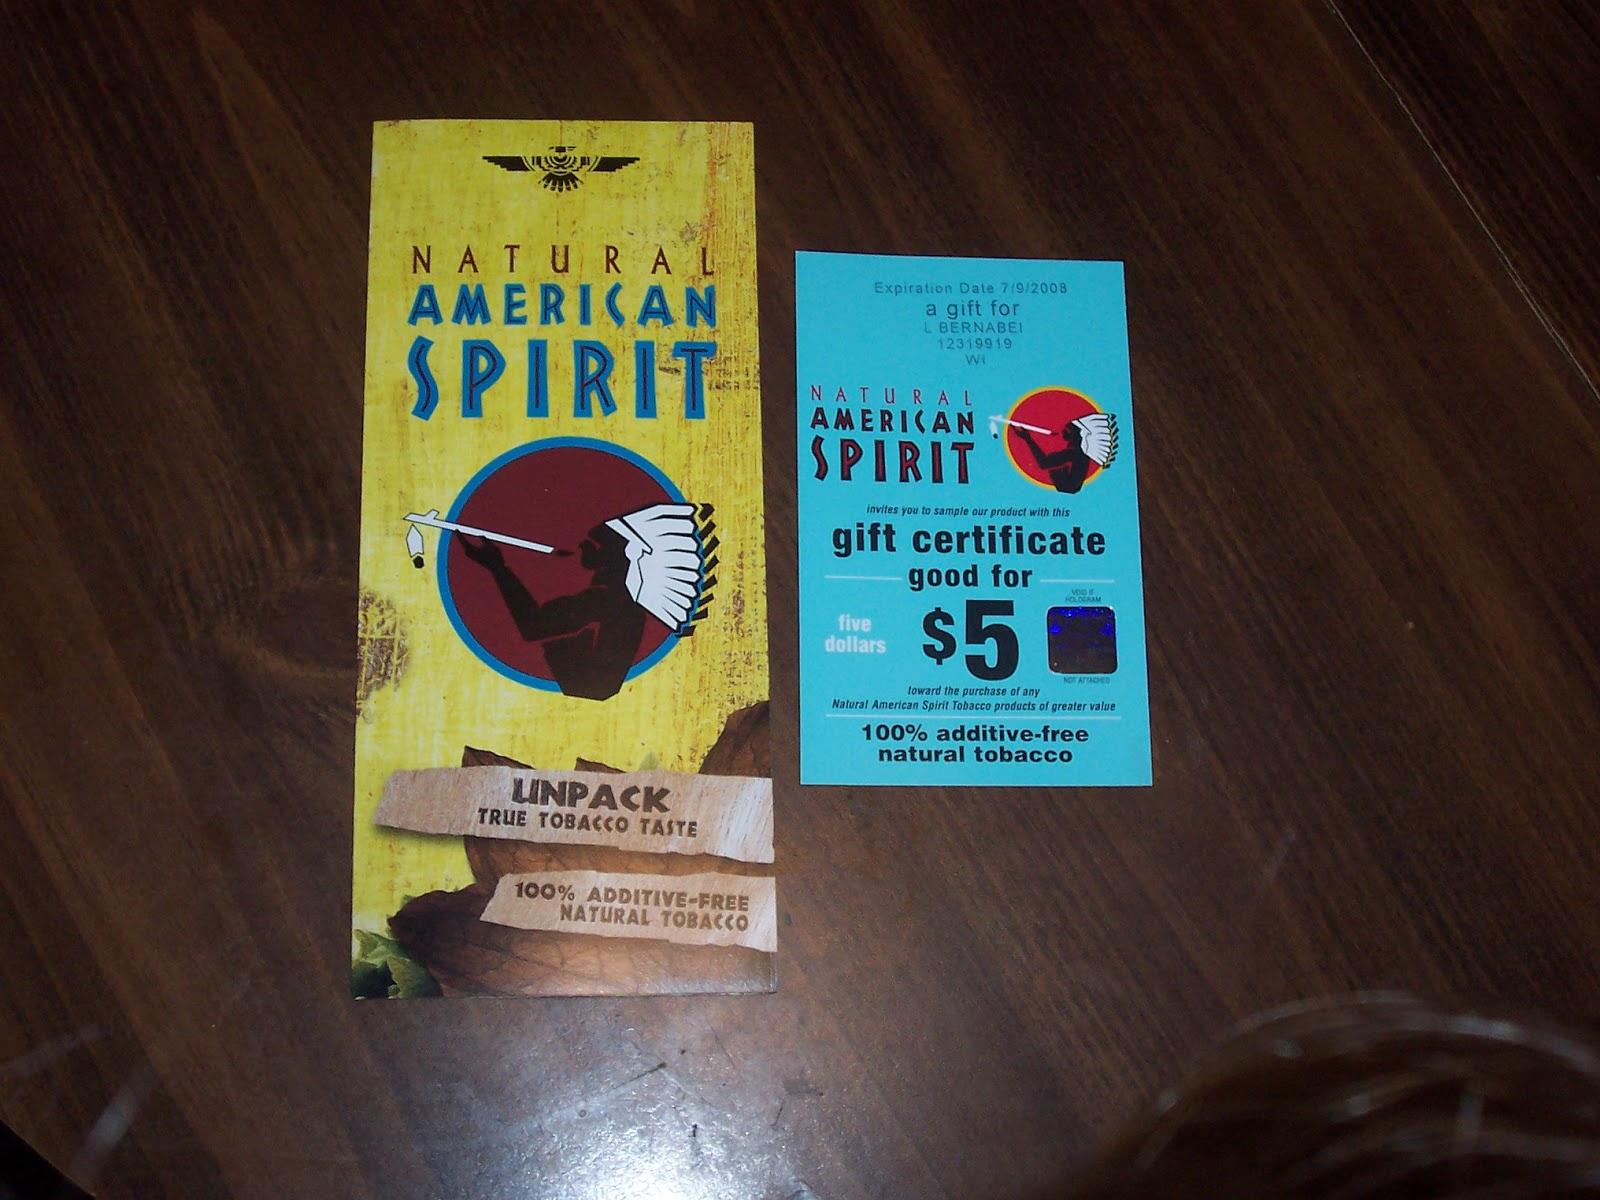 image regarding American Spirits Coupons Printable called Printable Cigarette Discount codes 2019: Free of charge American Spirit